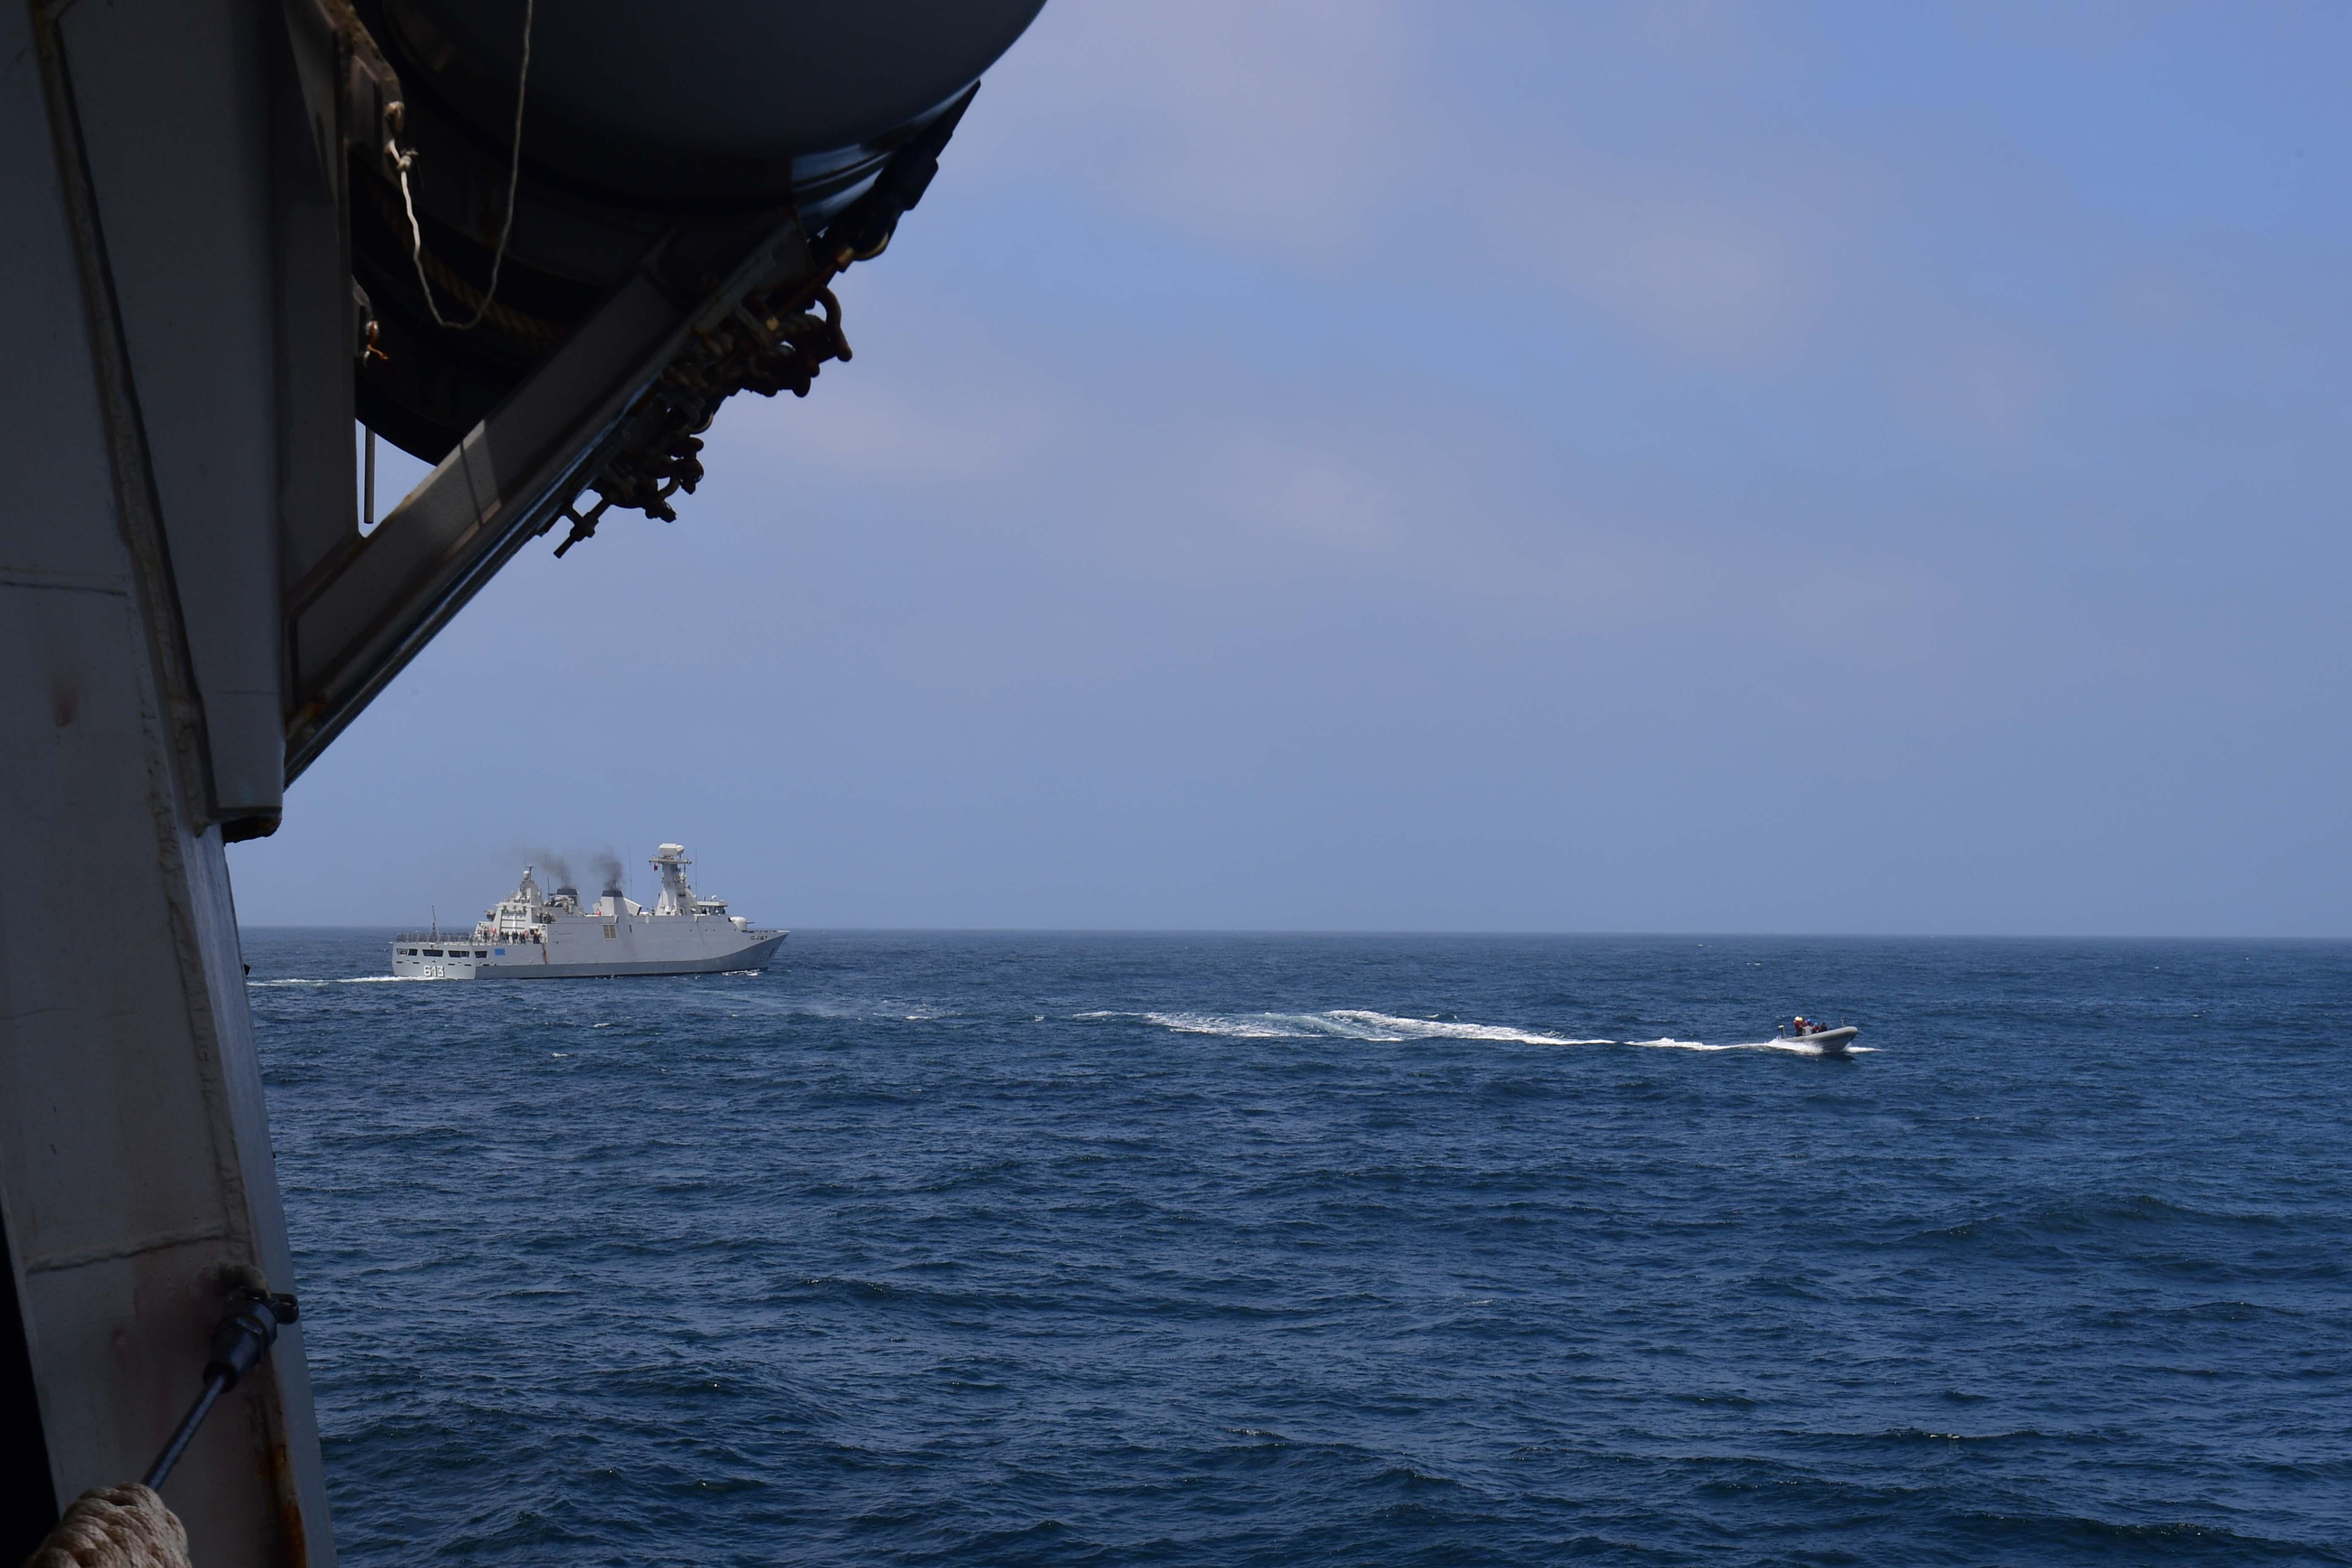 PASSEX 18 - USS ROSS (DDG71) et RMN Tarik Ben Ziyad (613) 42340409330_296f1b772c_o